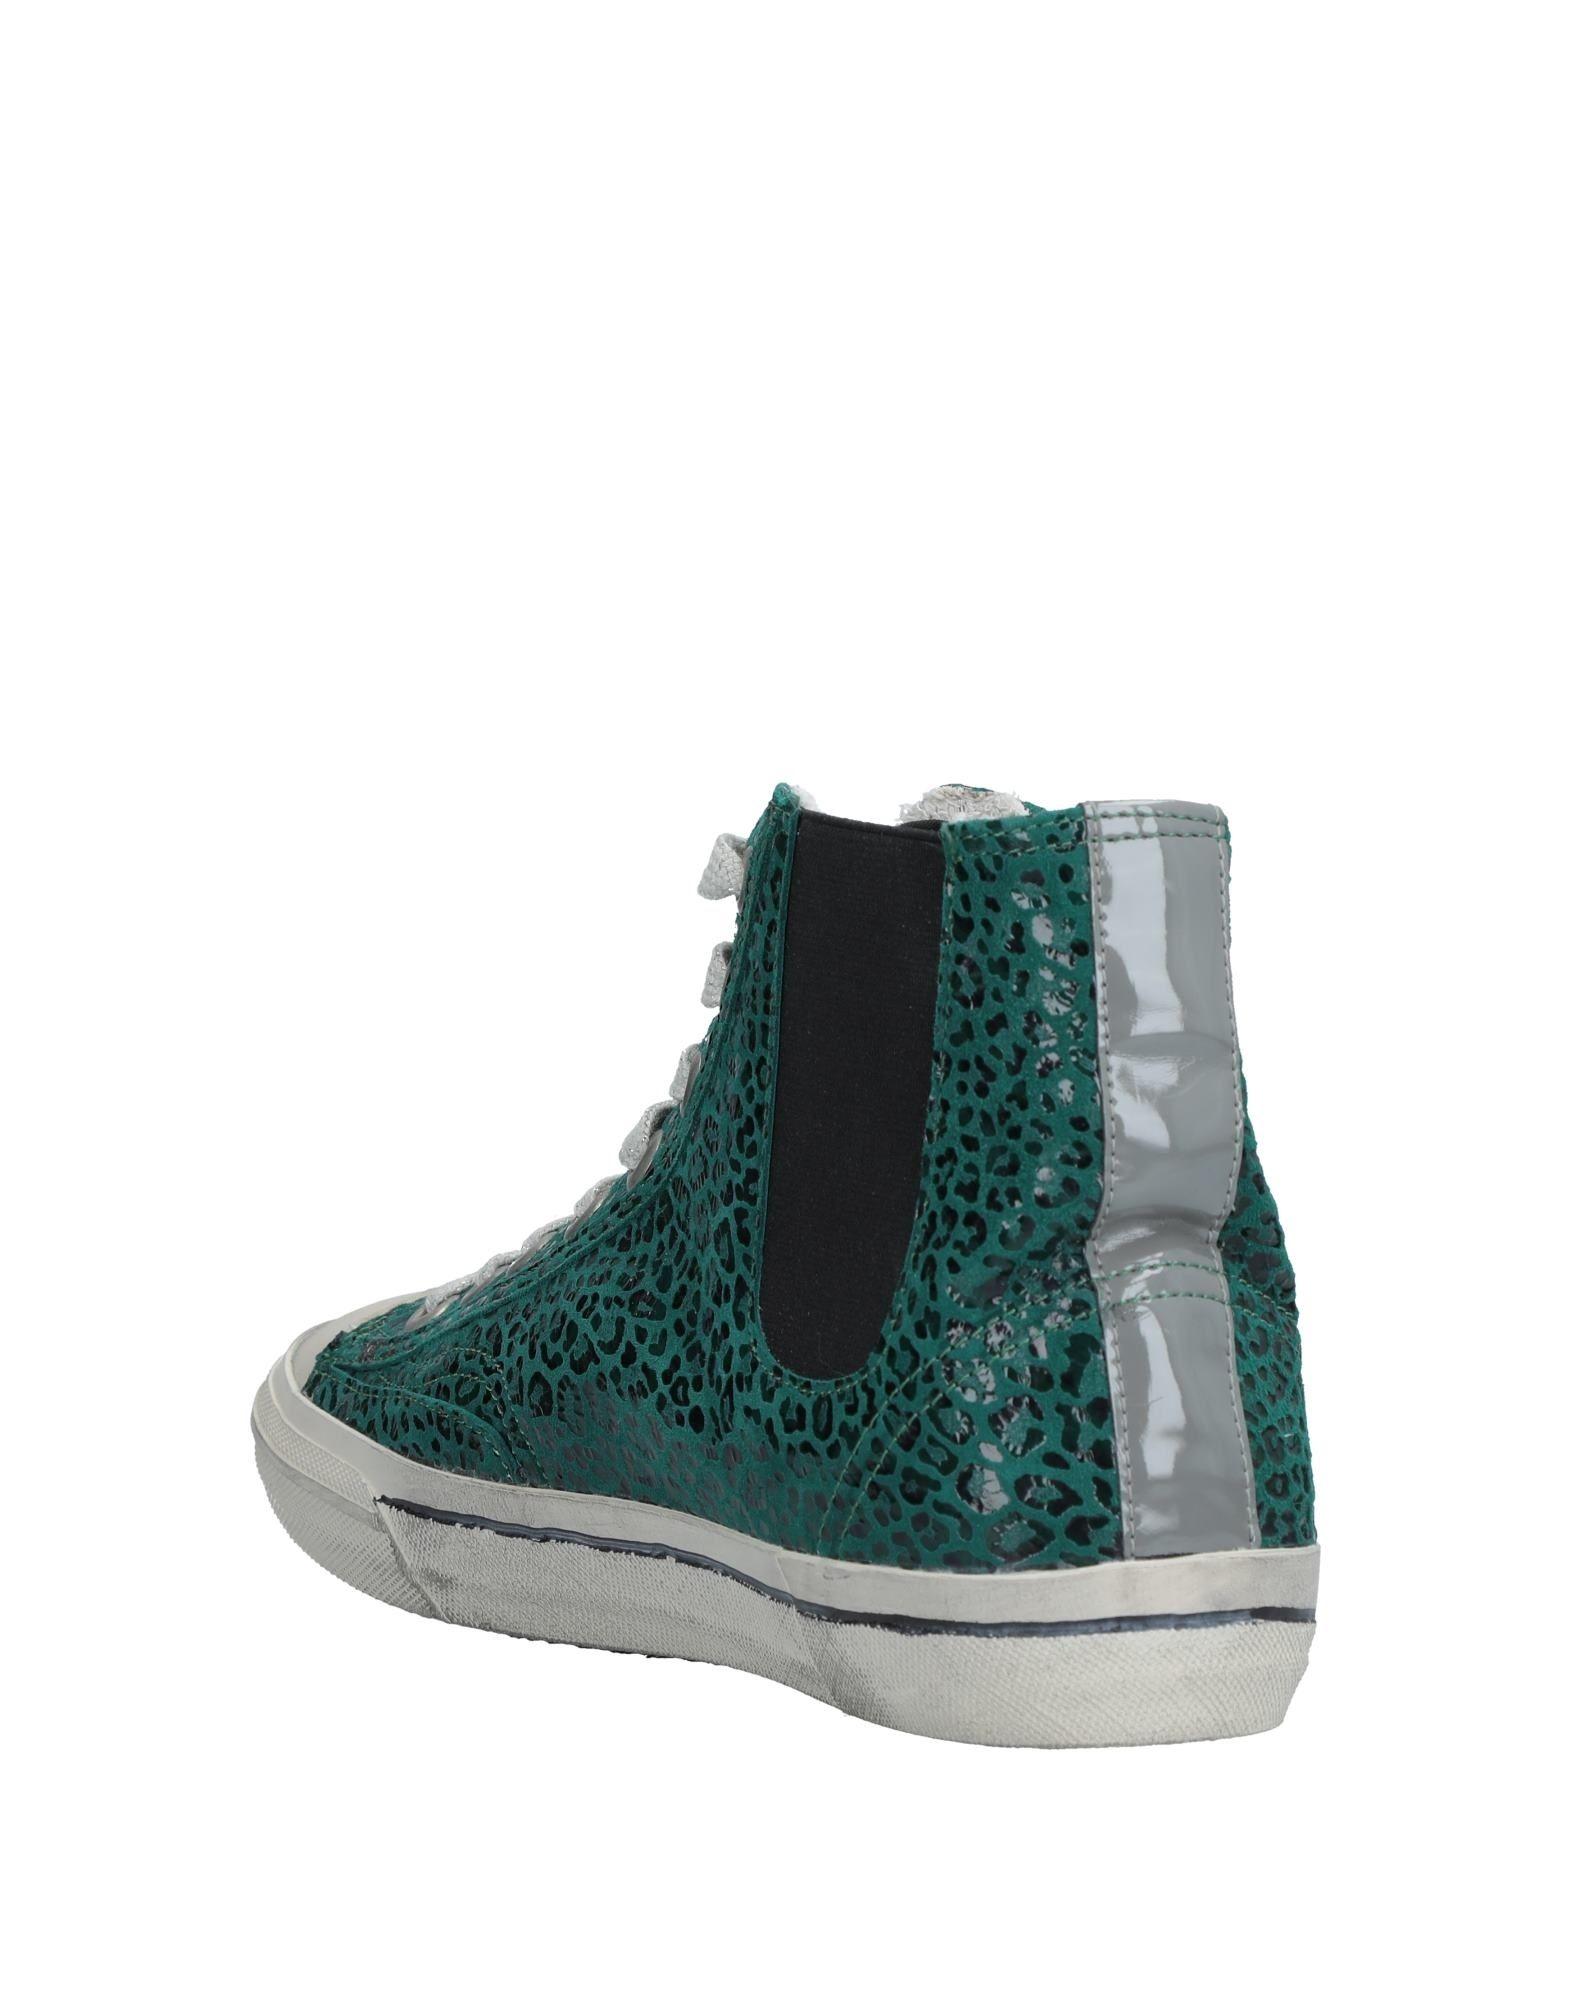 Golden Goose Damen Deluxe Brand Sneakers Damen Goose  11537394JP Neue Schuhe f8e36d